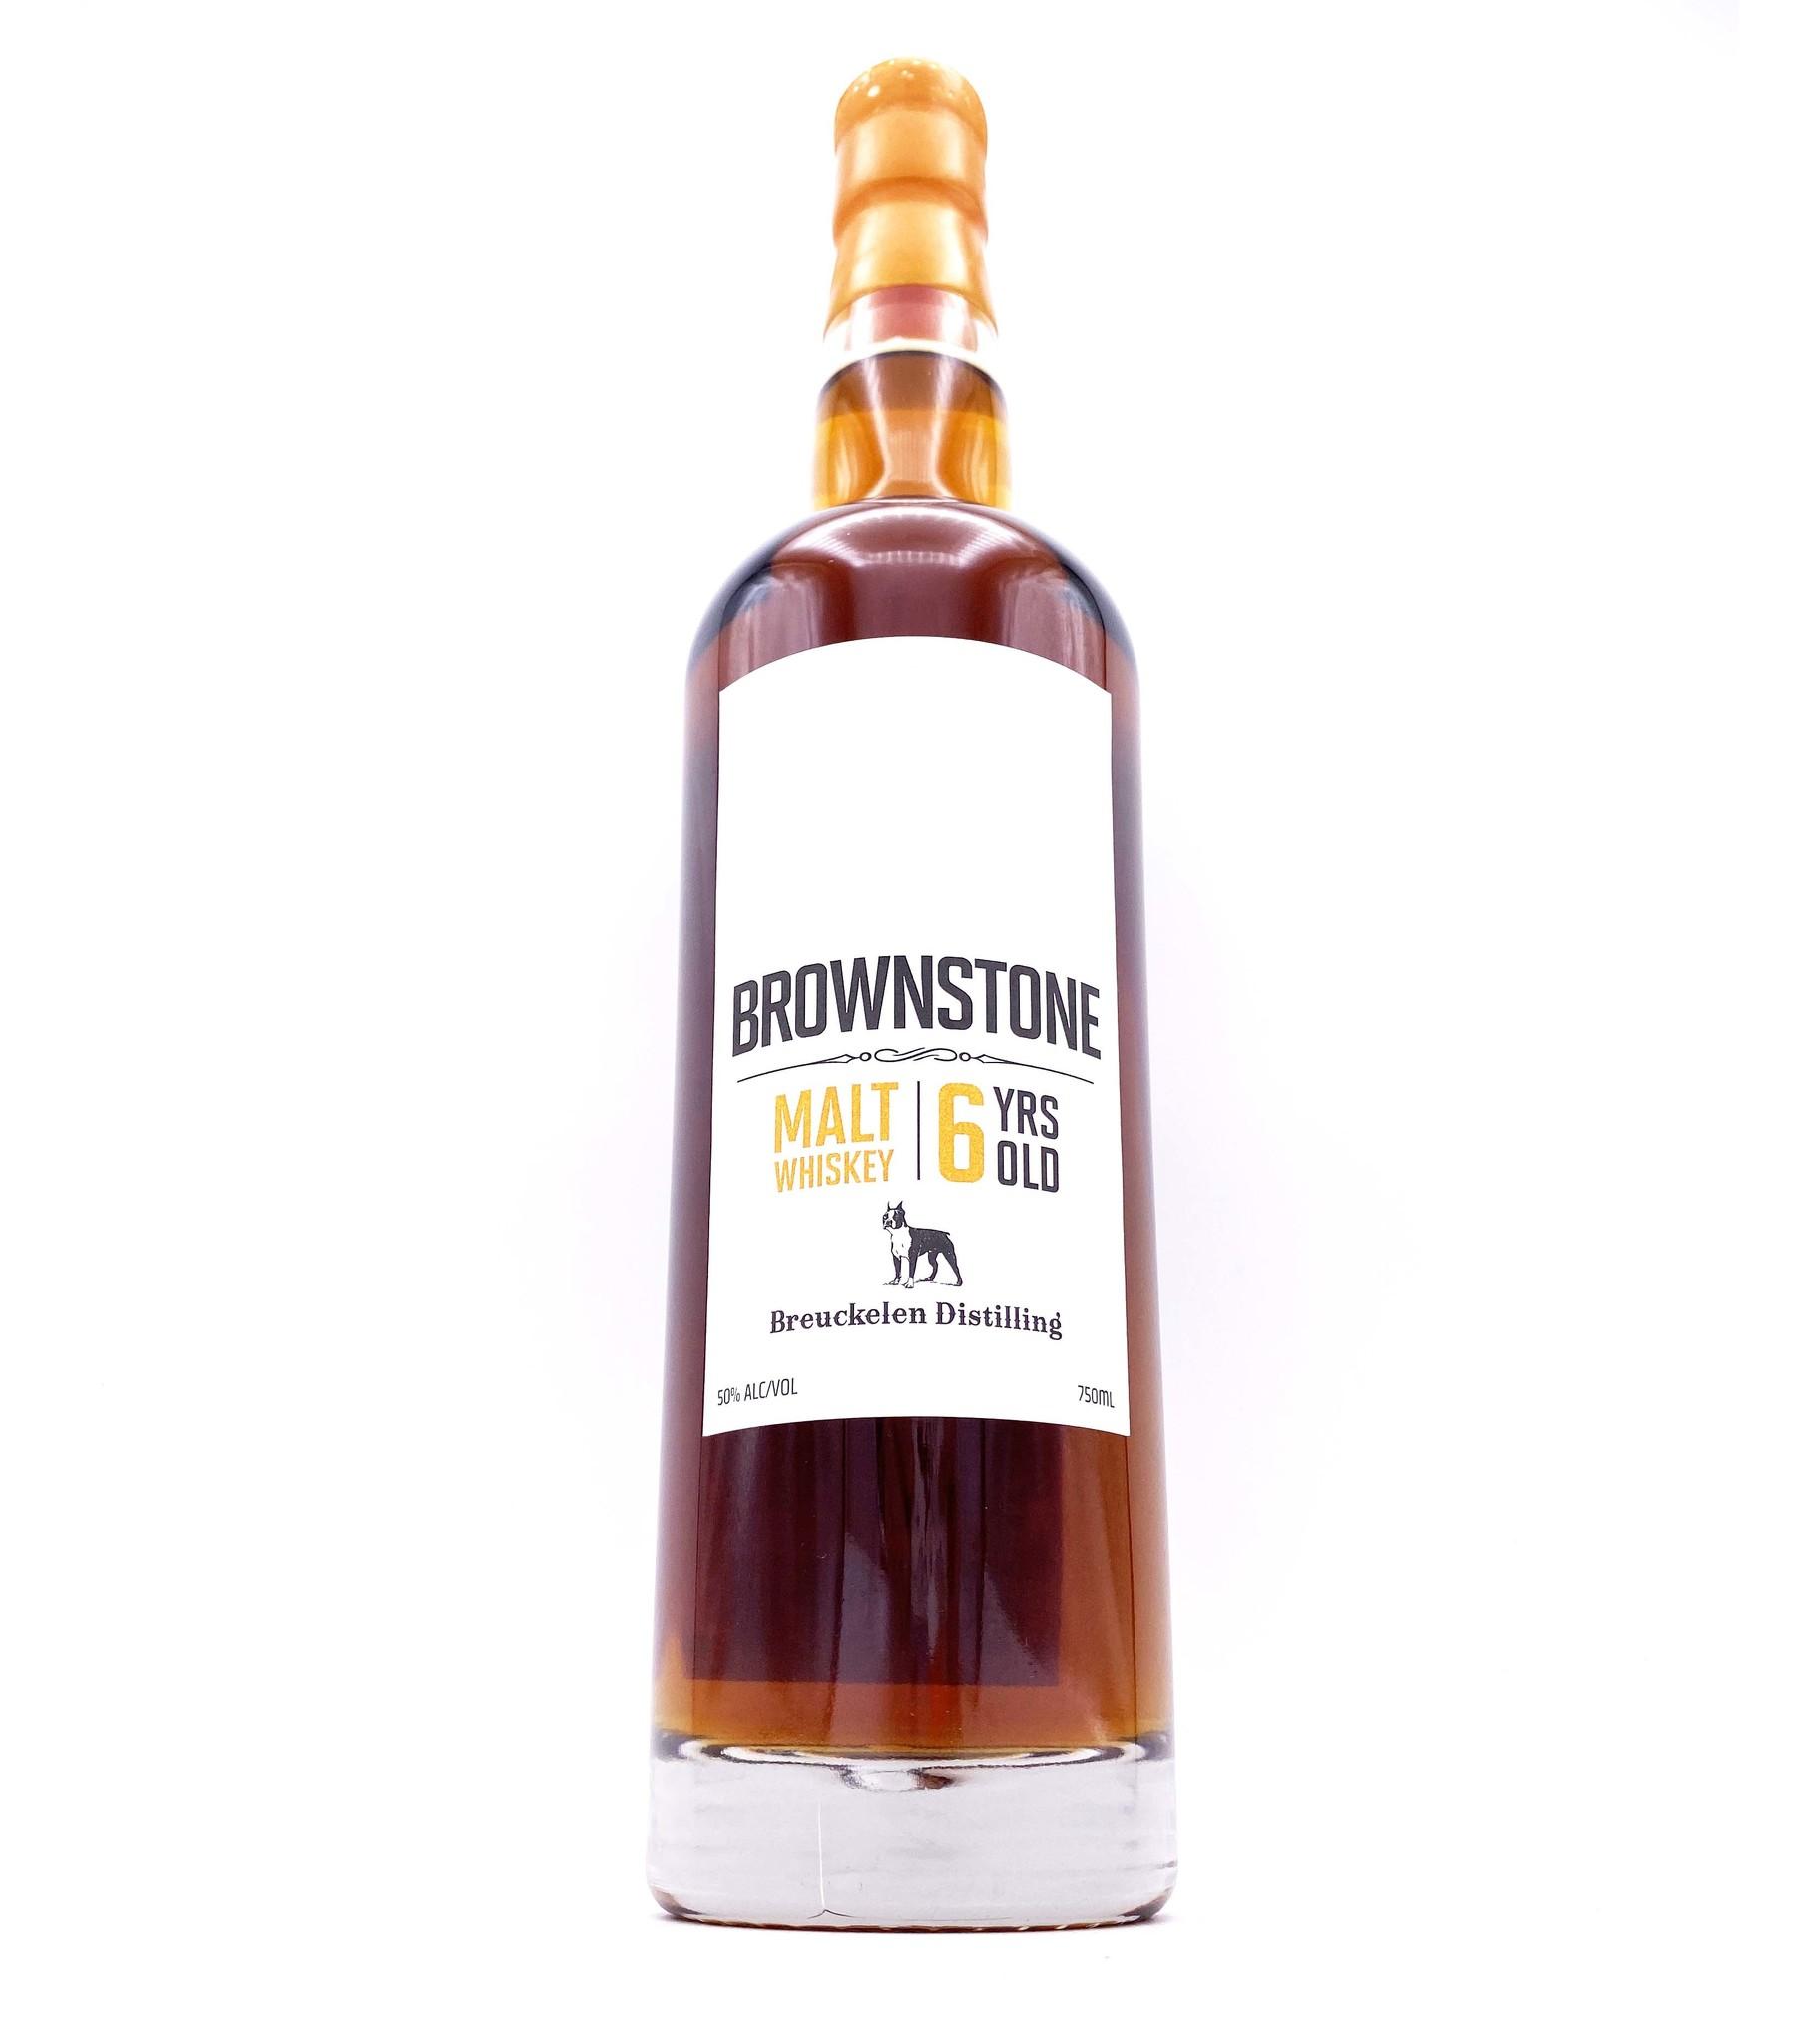 Brownstone Single Malt 6-Year-old Breuckelen Distilling